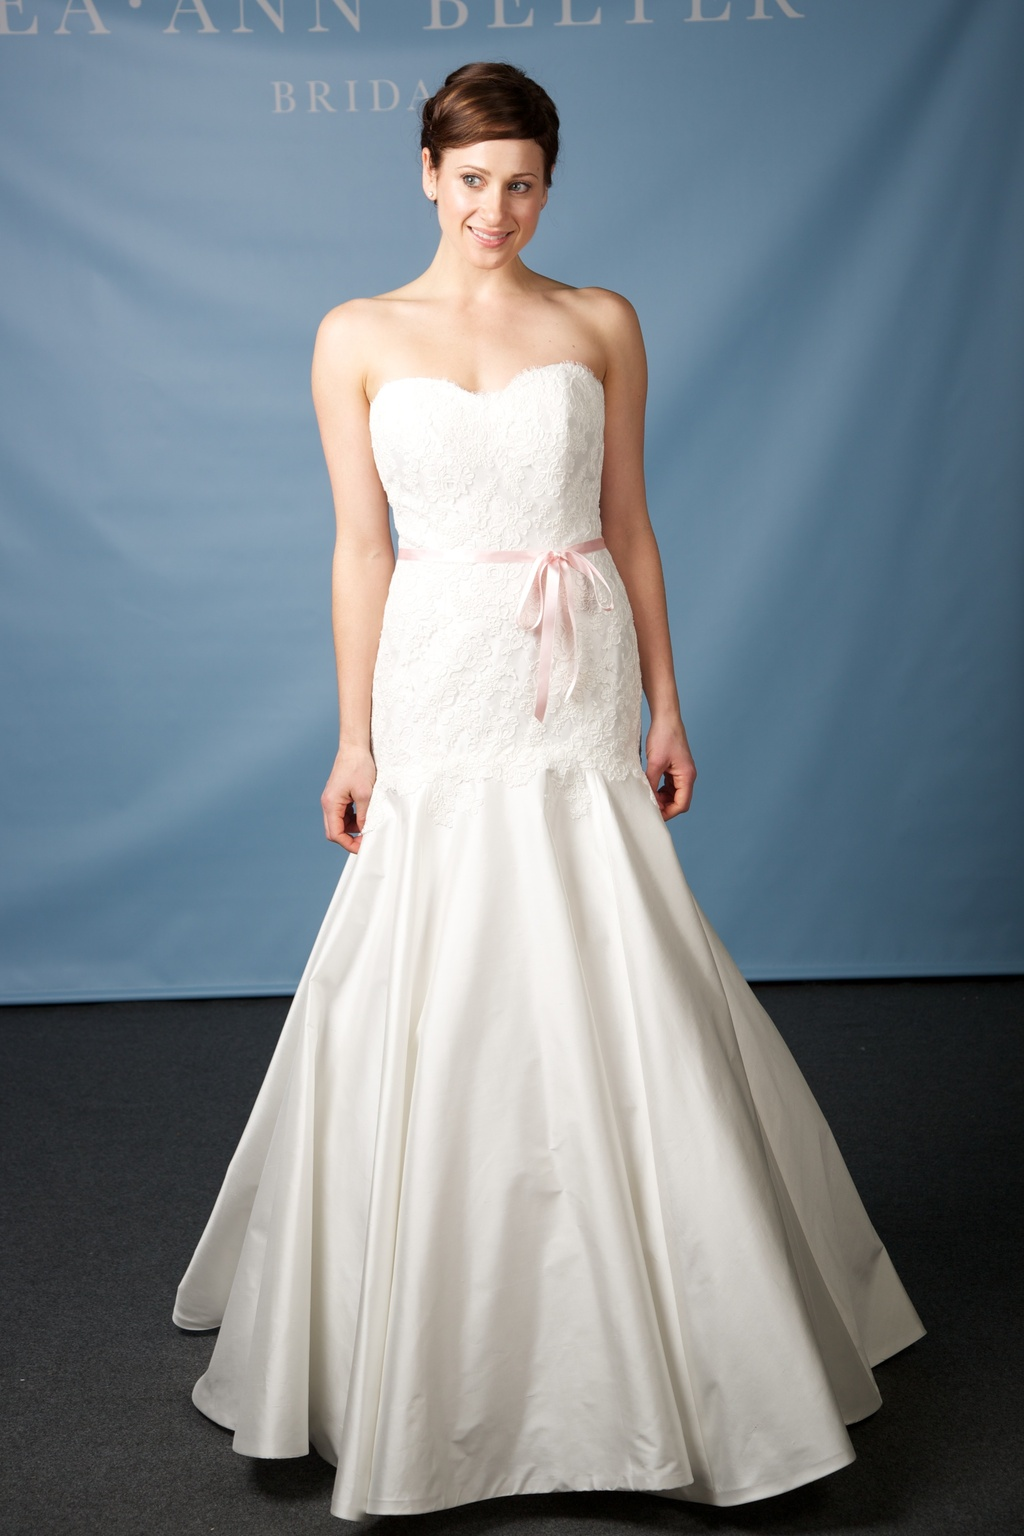 Lea-ann-belter-wedding-dress-2013-bridal-maude.full